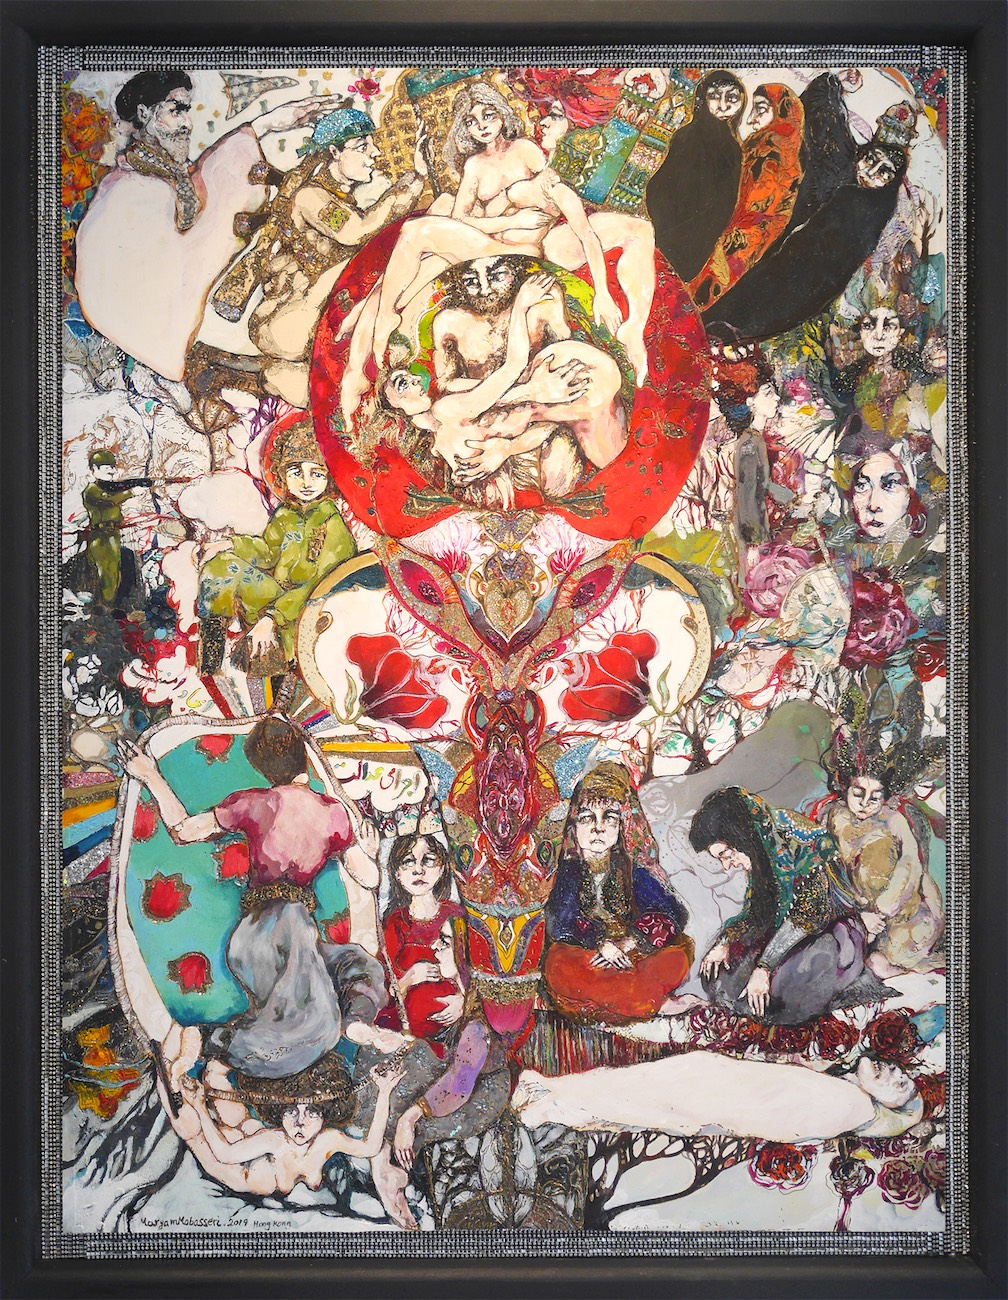 Maryam Mobasseri, Life Cycle 2, 2019. 76cm x 59cm, Mixed media on laser cut wood panel.